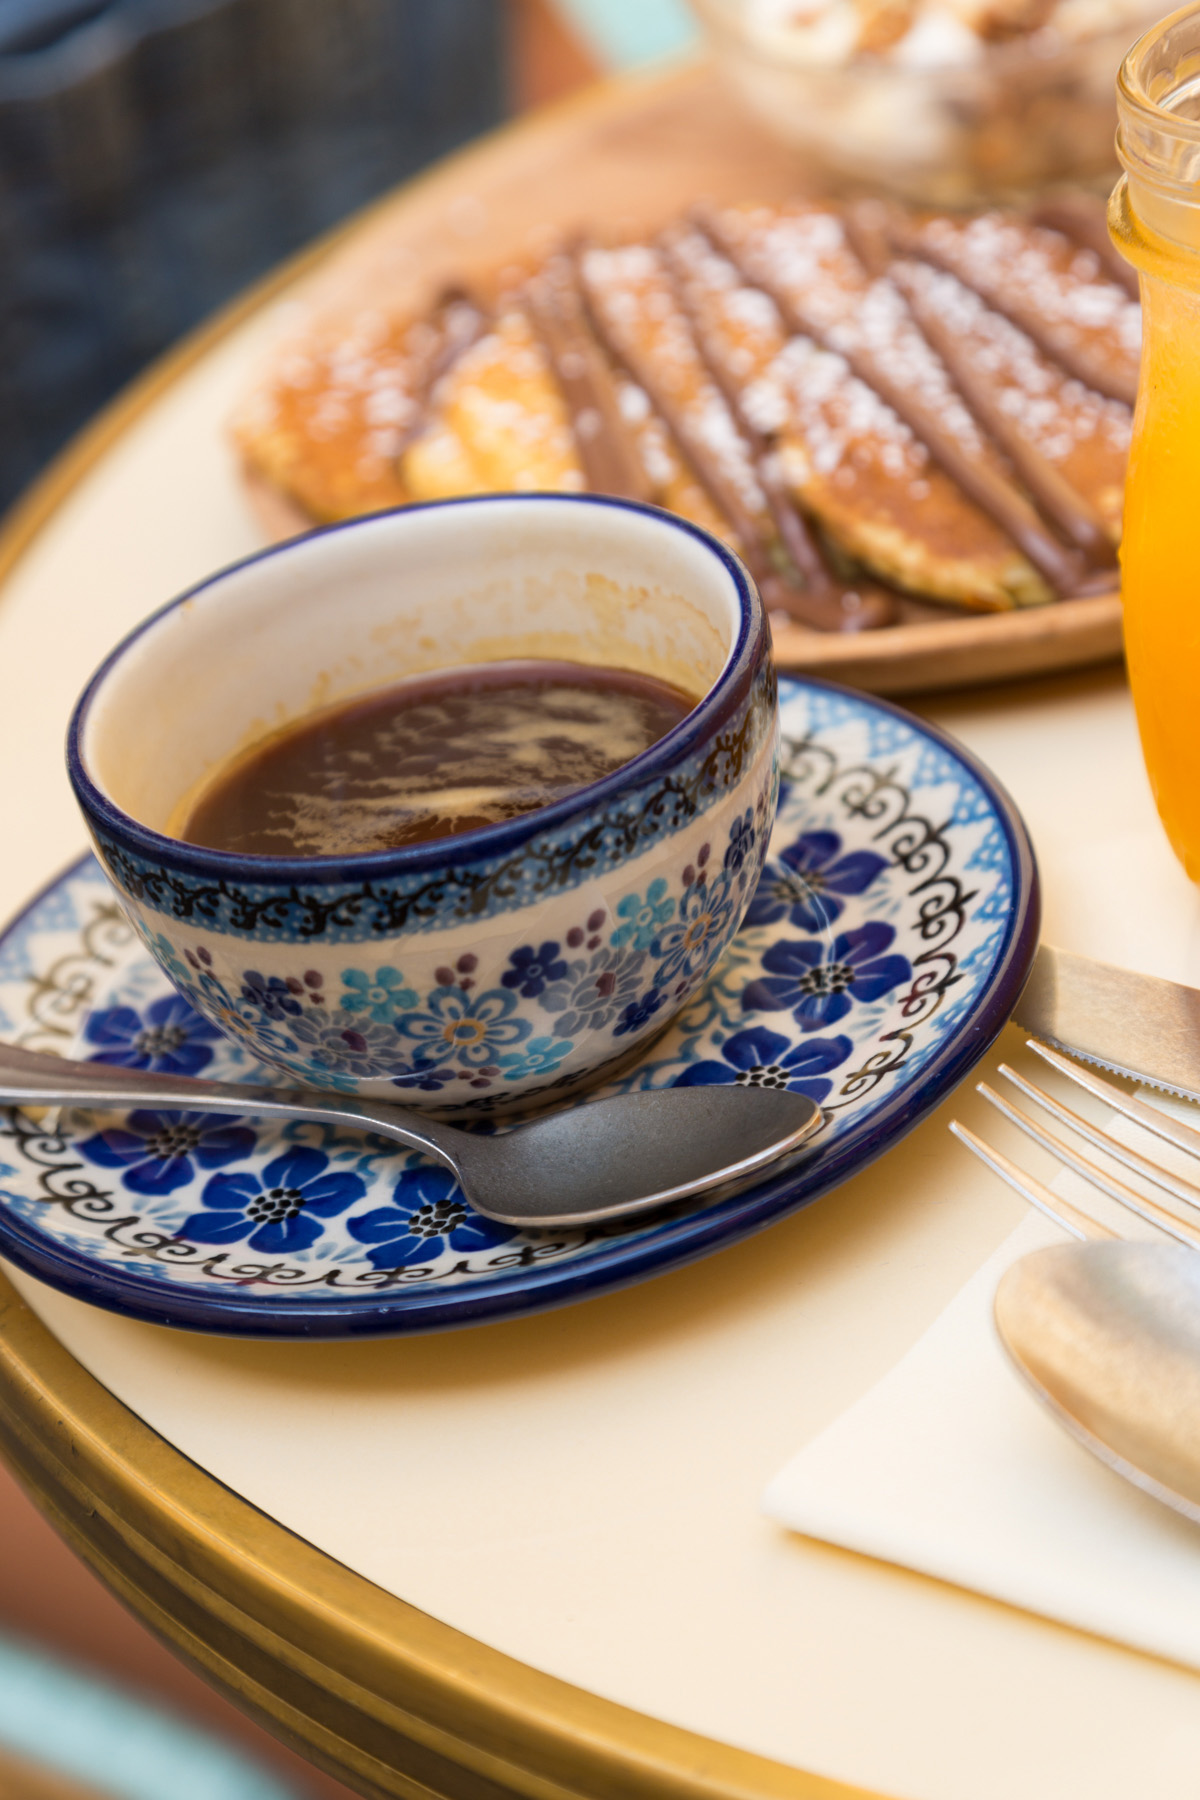 Marinette Coffee Kitchen Bakery